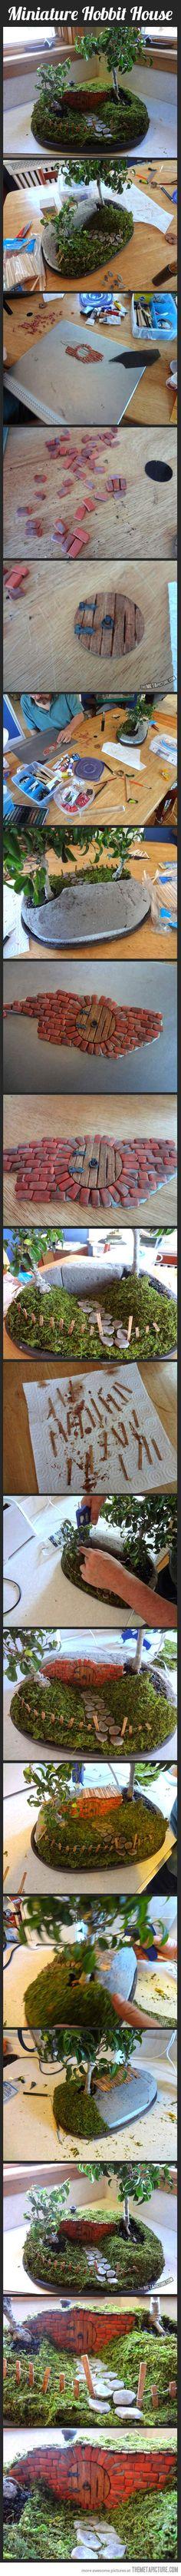 An even smaller version of Bilbo's house…  Love the door.